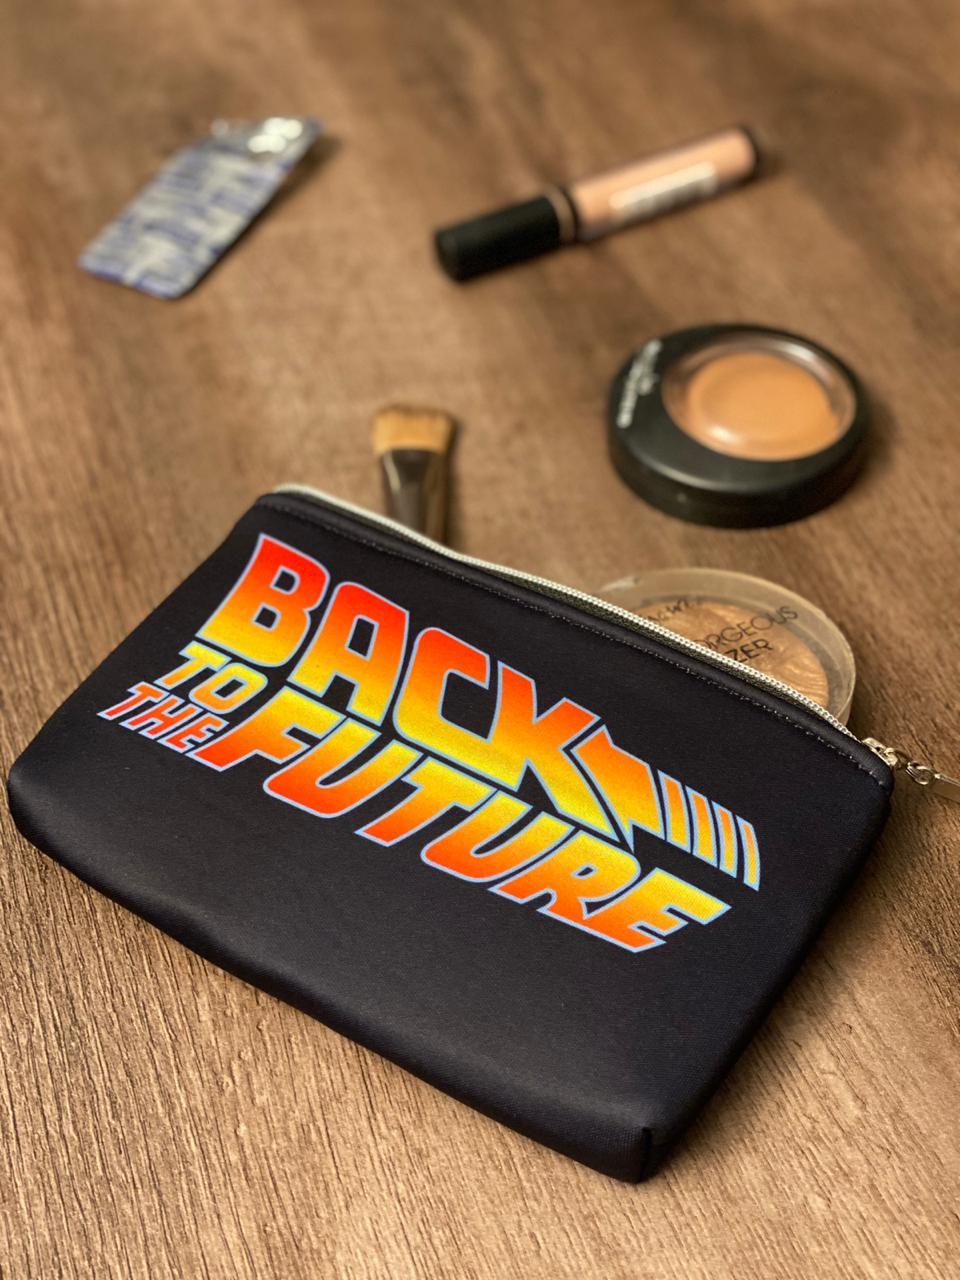 Necessaire De Volta Para o Futuro (Back To the Future)